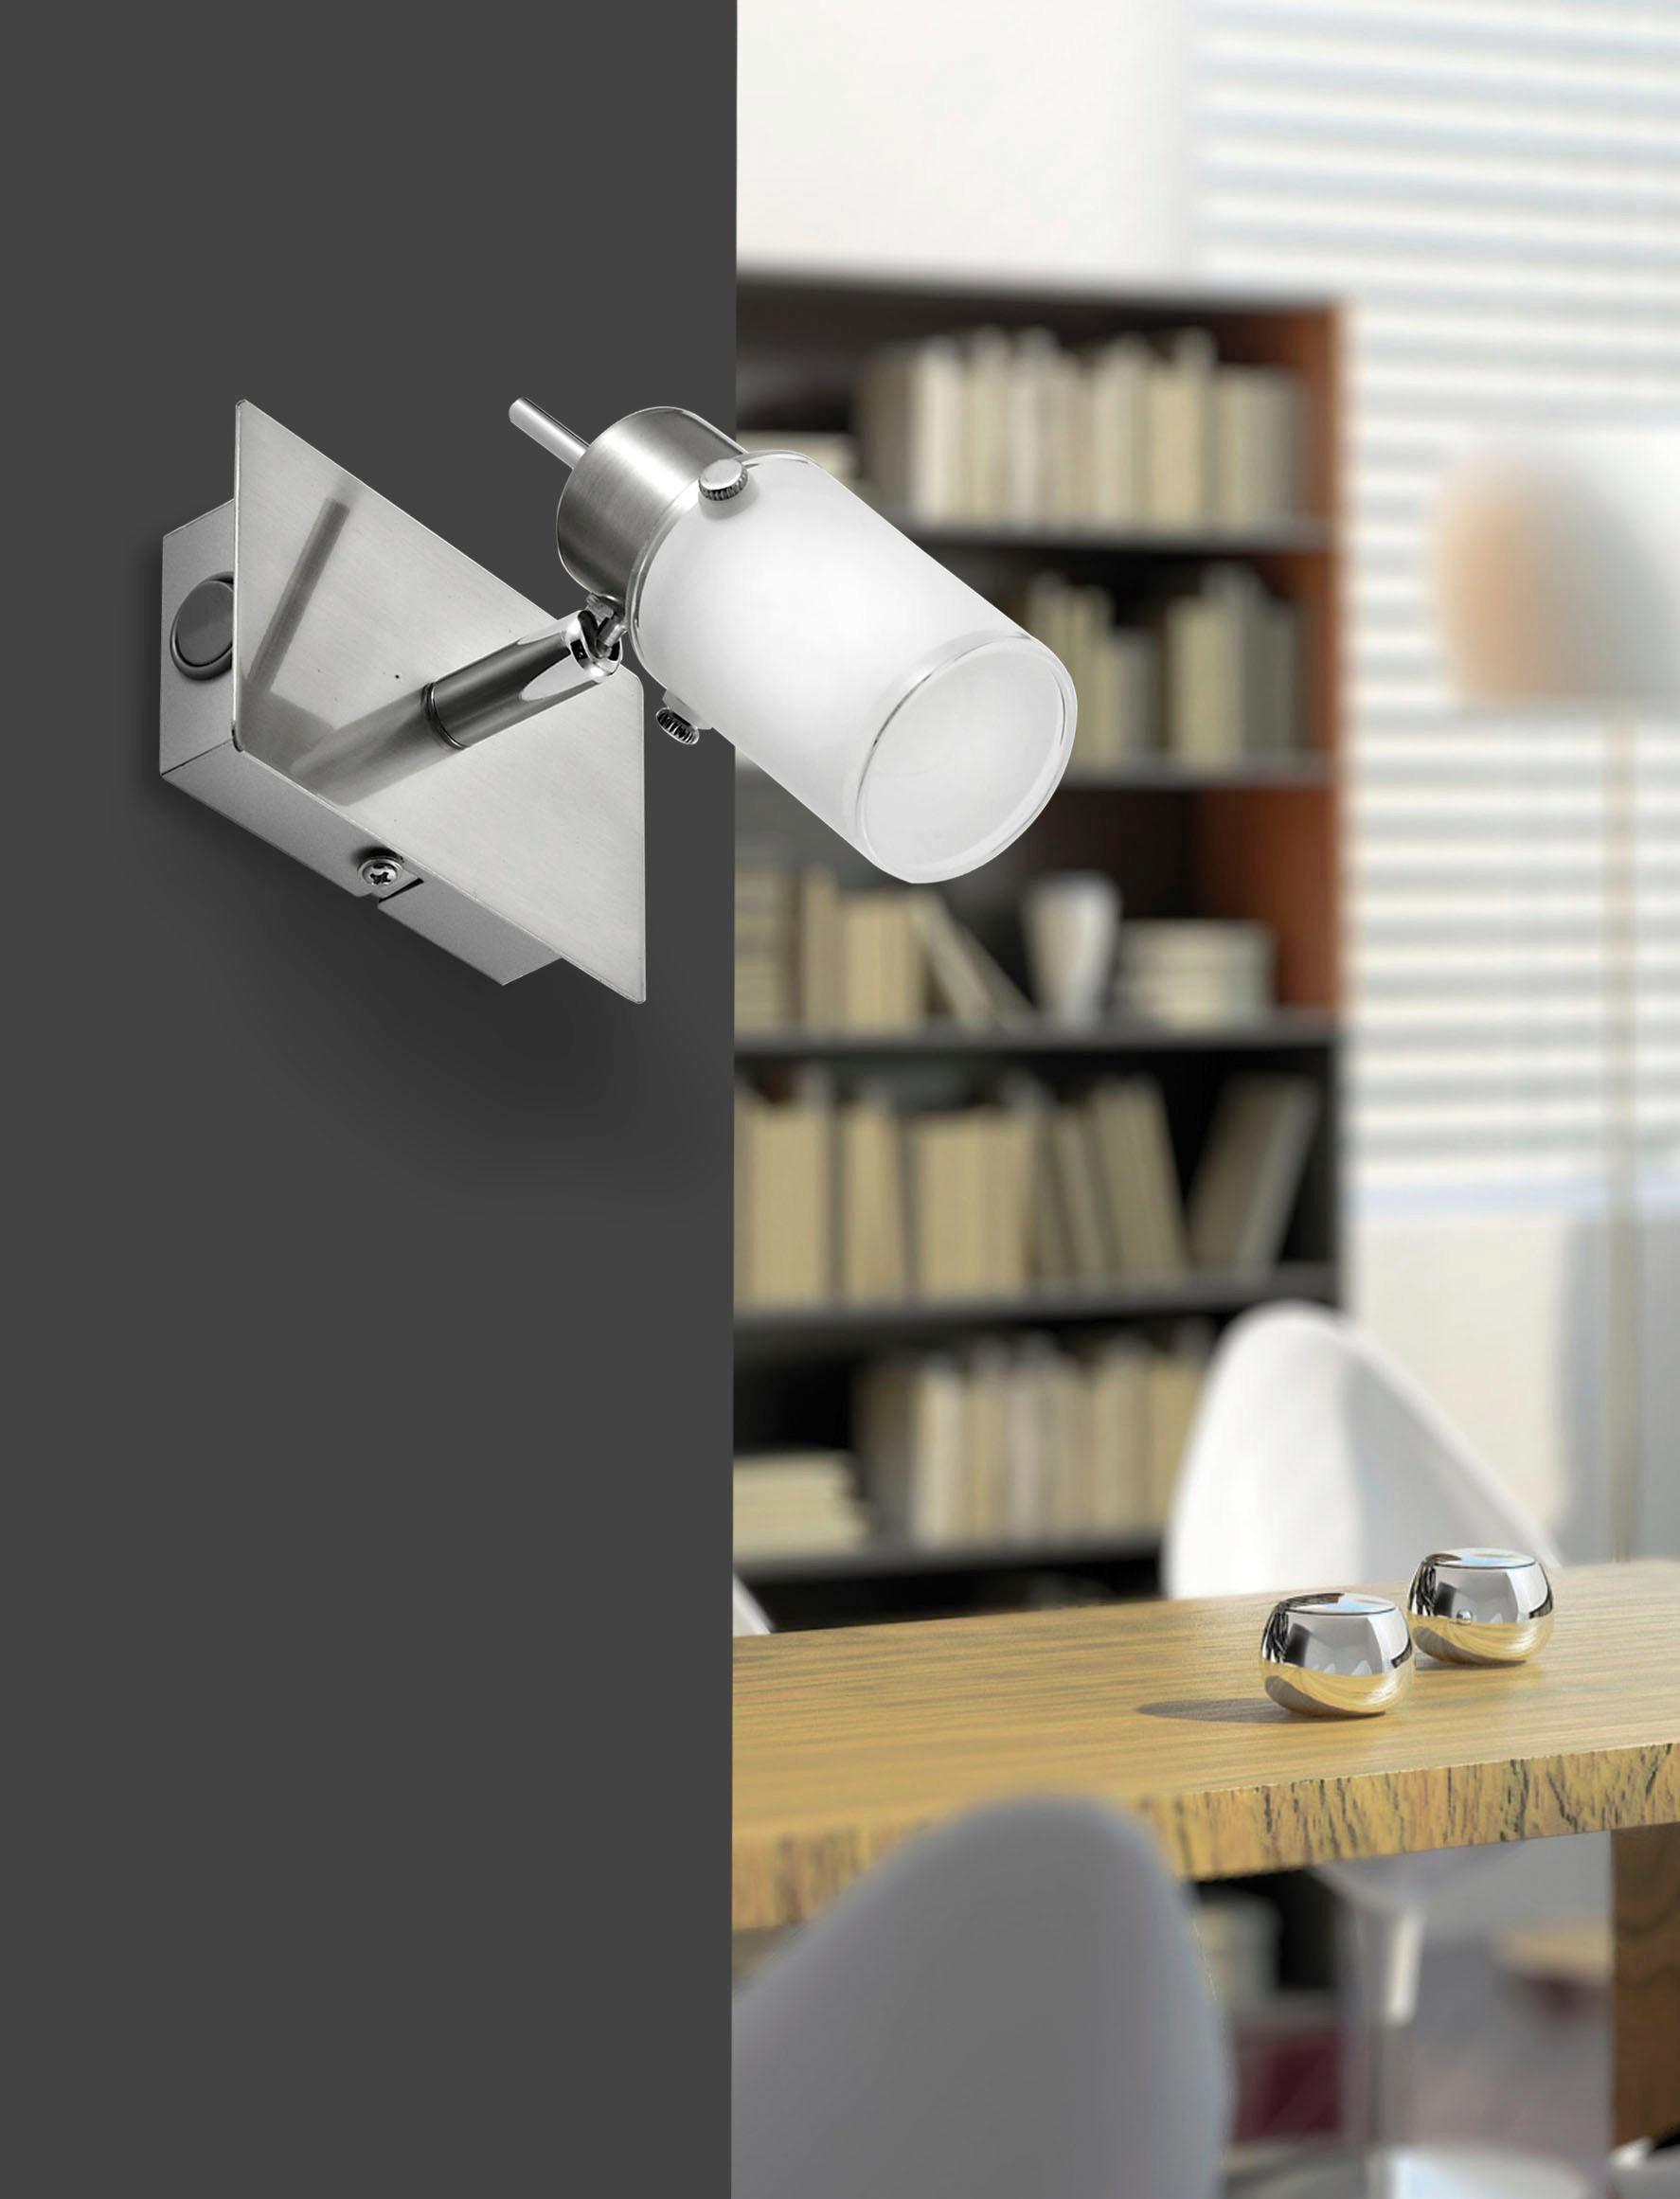 LED SVÍTIDLO - bílá, Konvenční, kov/sklo (15/16,5/15cm) - NOVEL